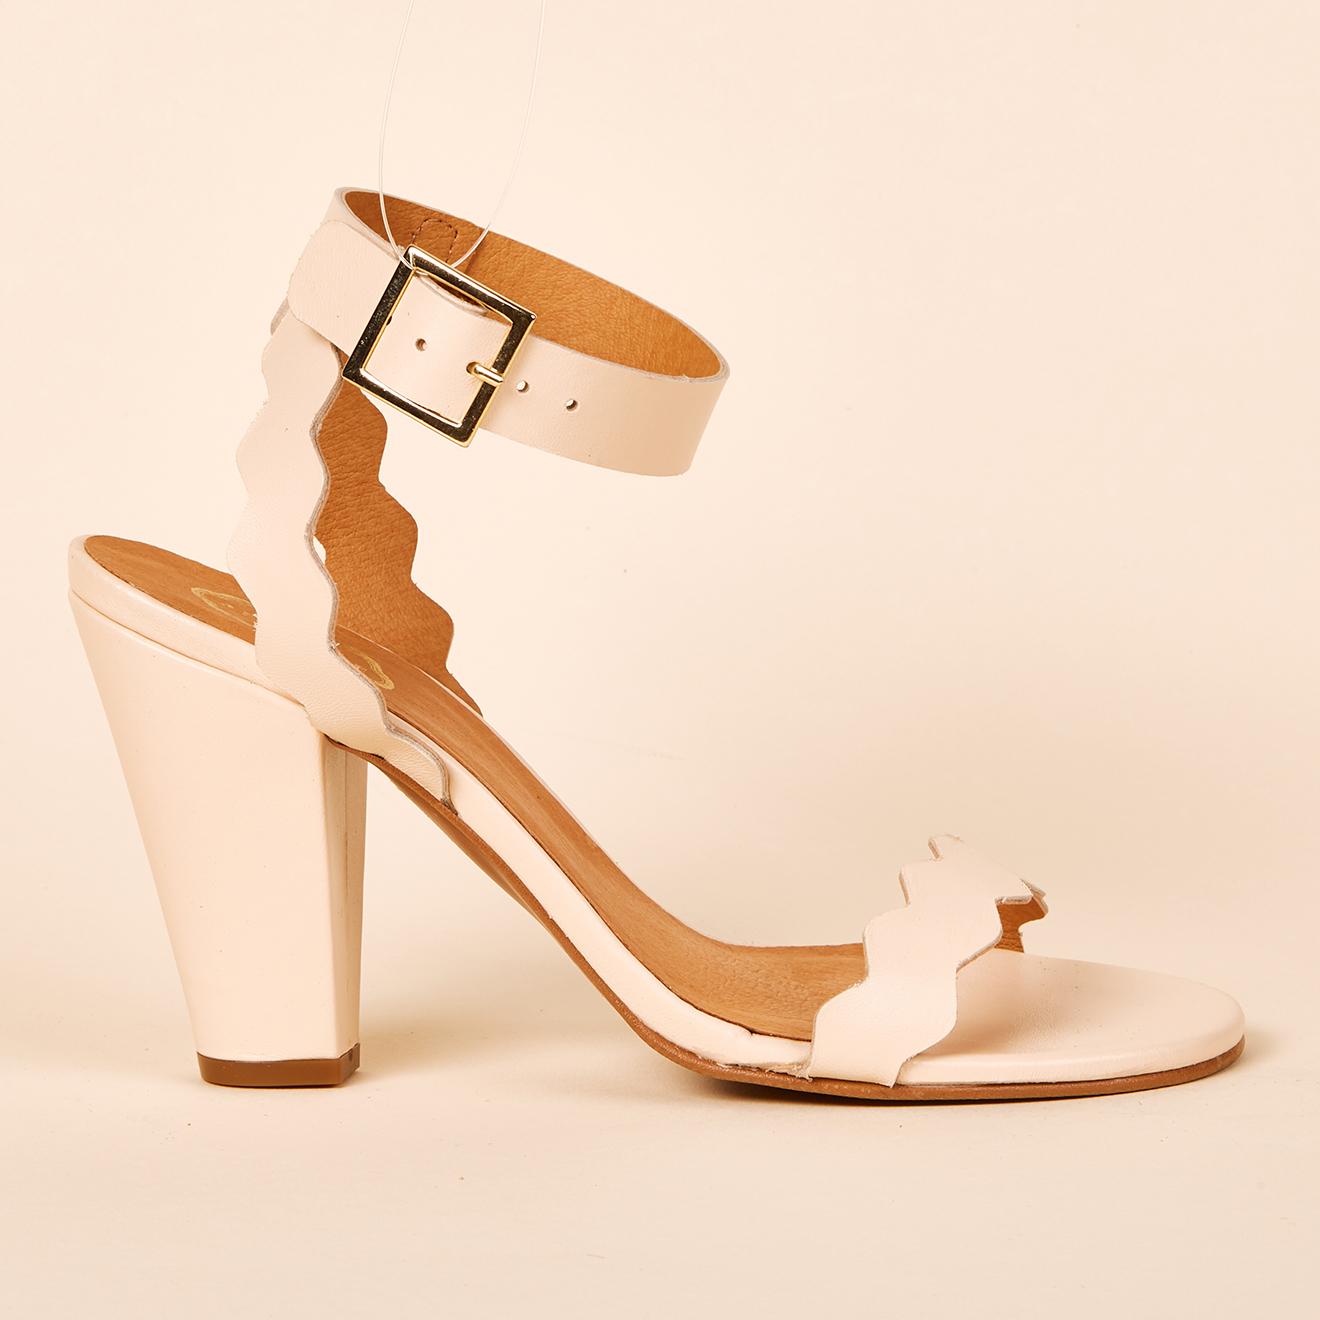 Sandales en Cuir nude - Talon 9 cm - Apologie - Modalova